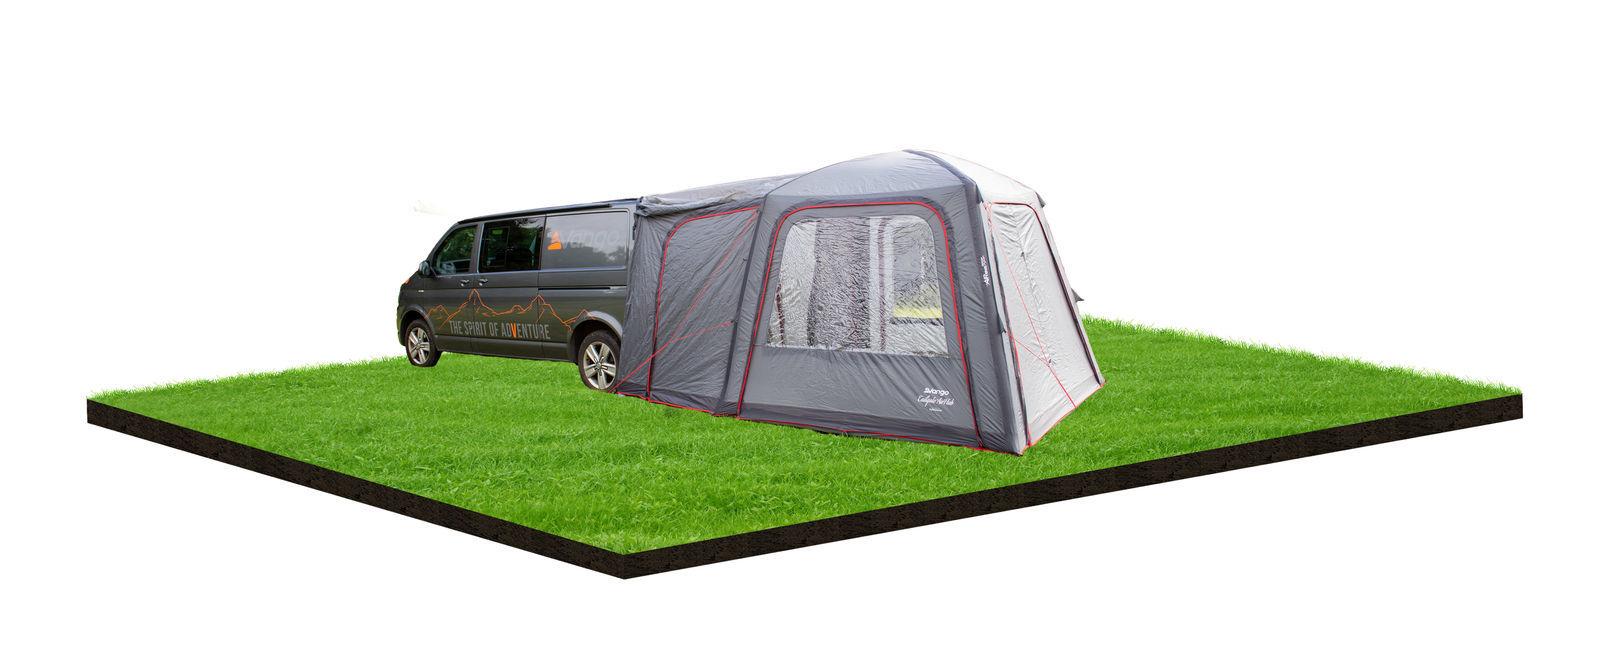 Vango Tailgate Airhub Low 2021 Norwich Camping 6